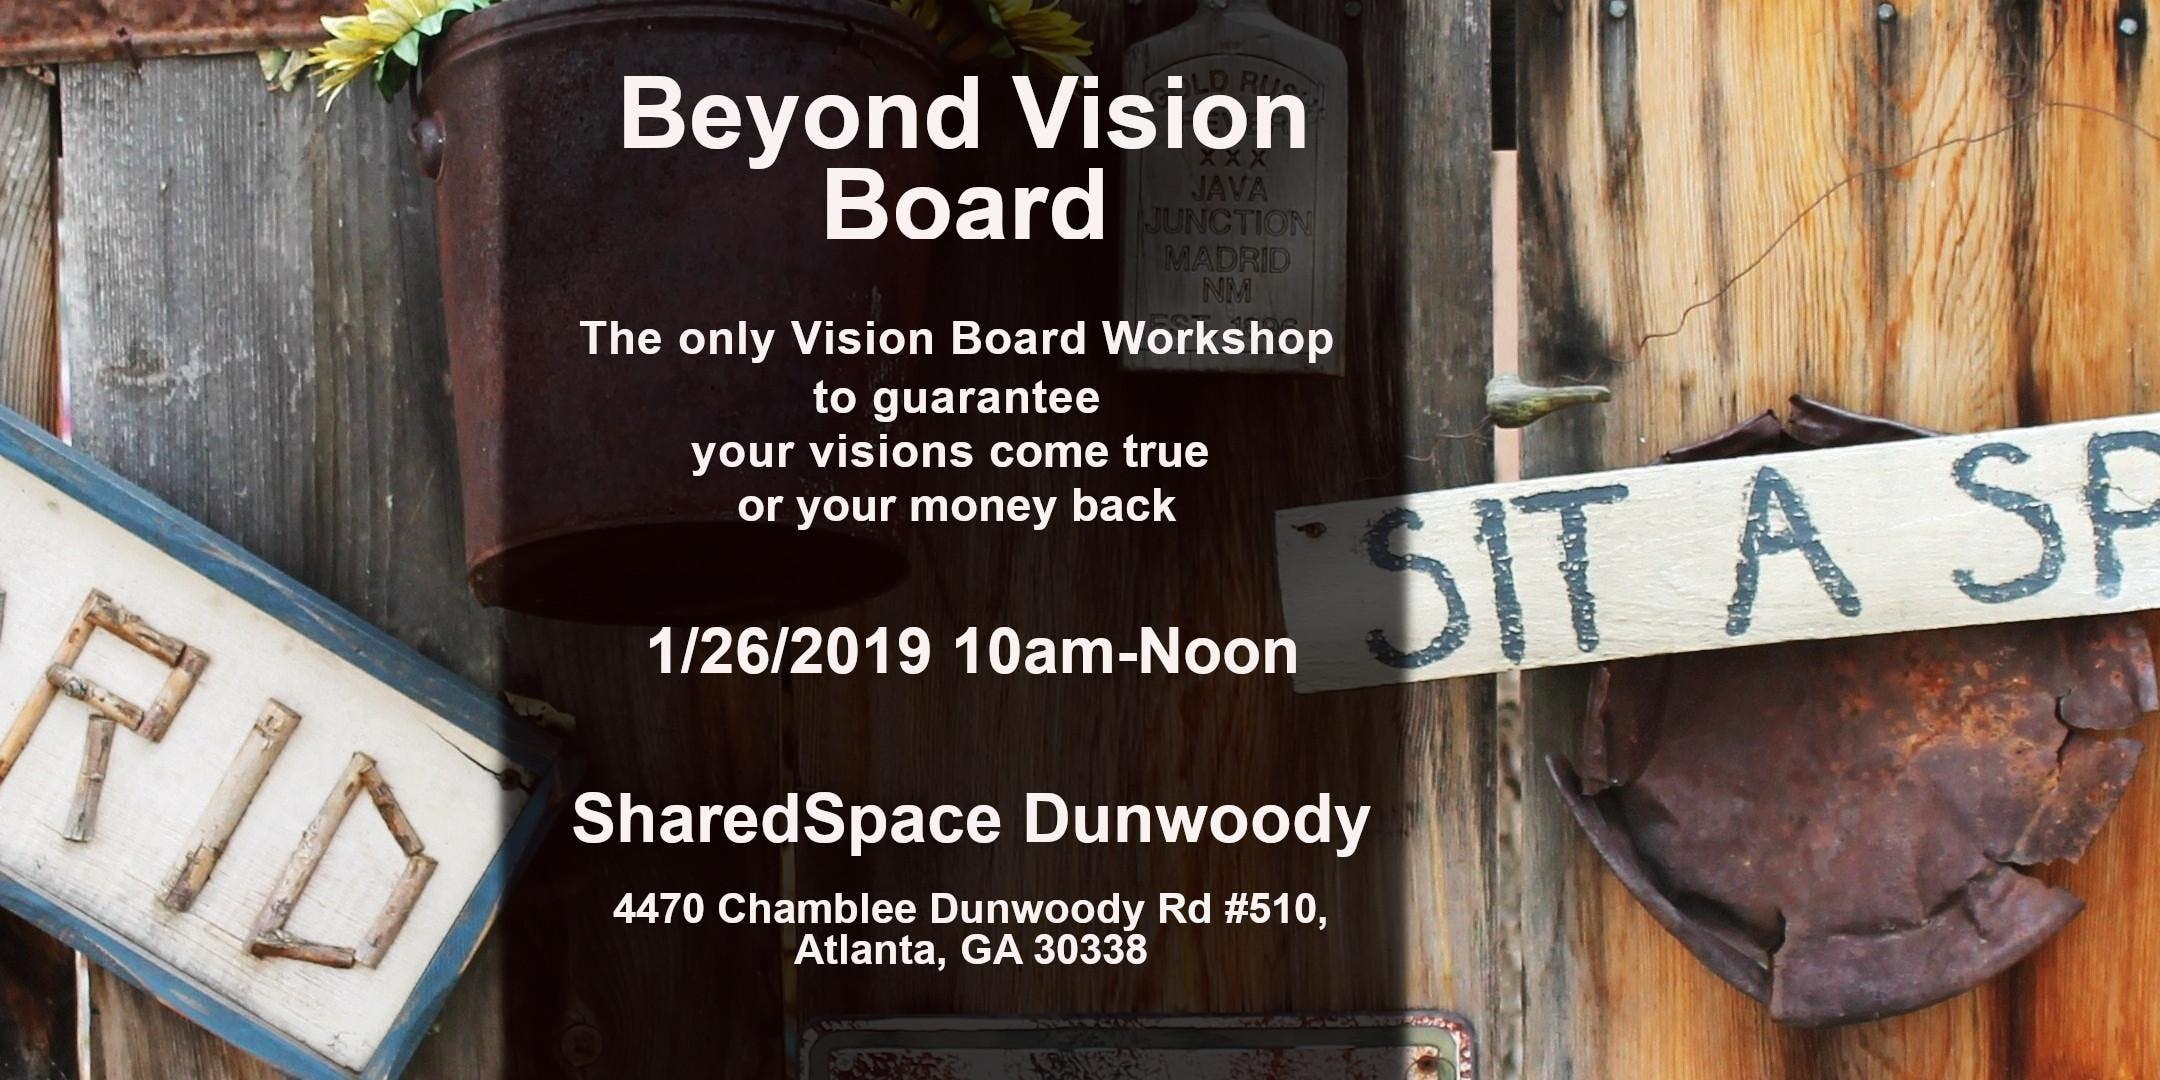 Beyond Vision Board